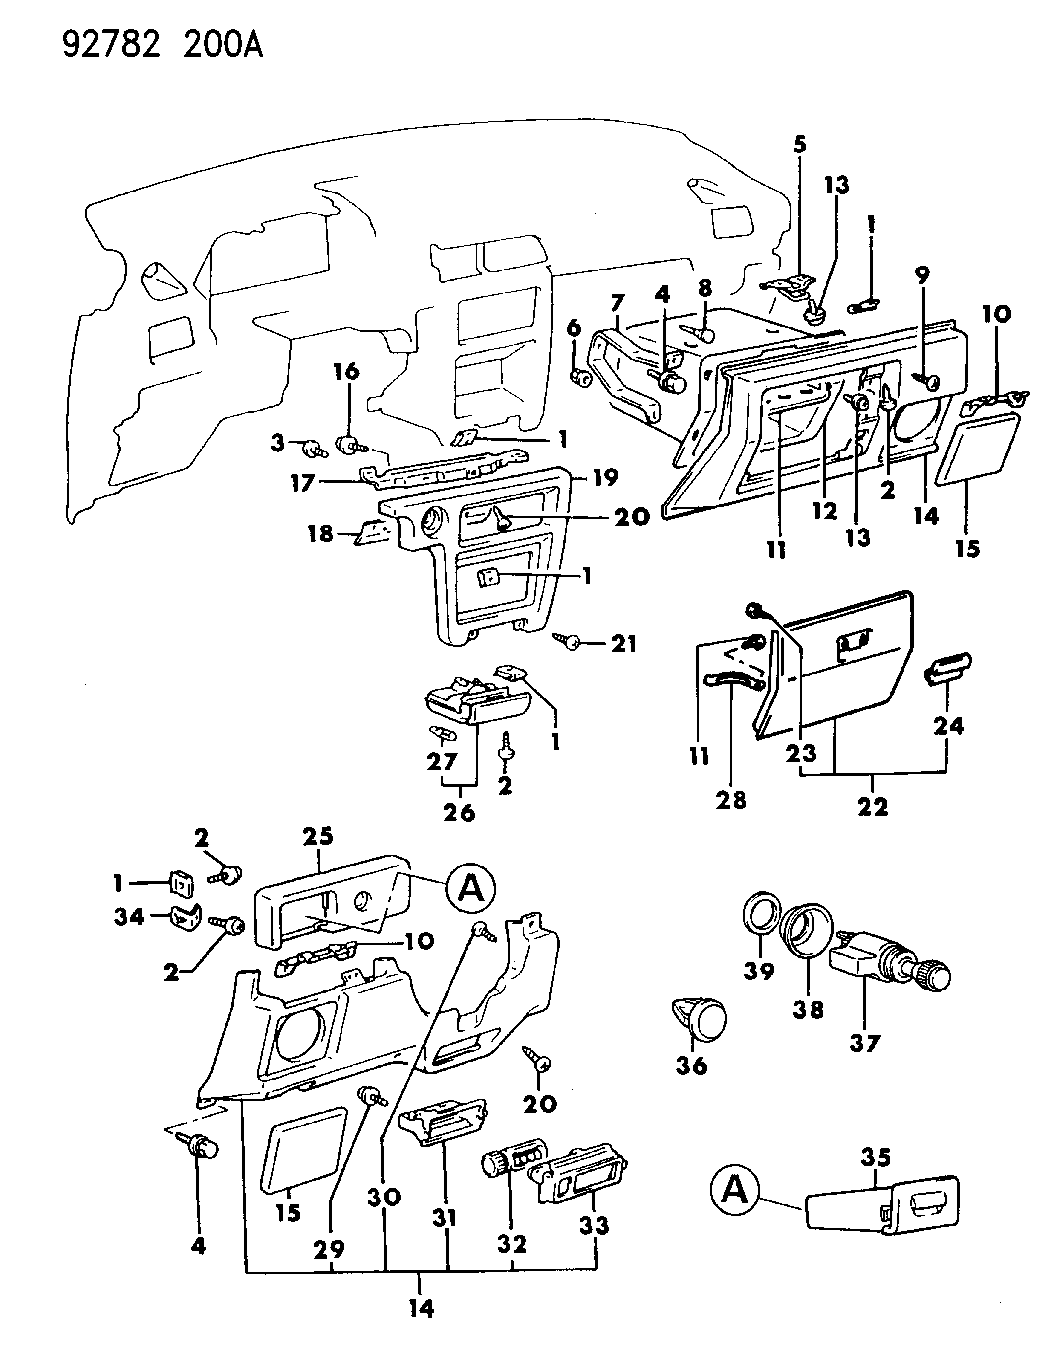 Dodge Colt Fuse Box Wiring Library 1991 B350 1993 Instrument Panel Thumbnail 1